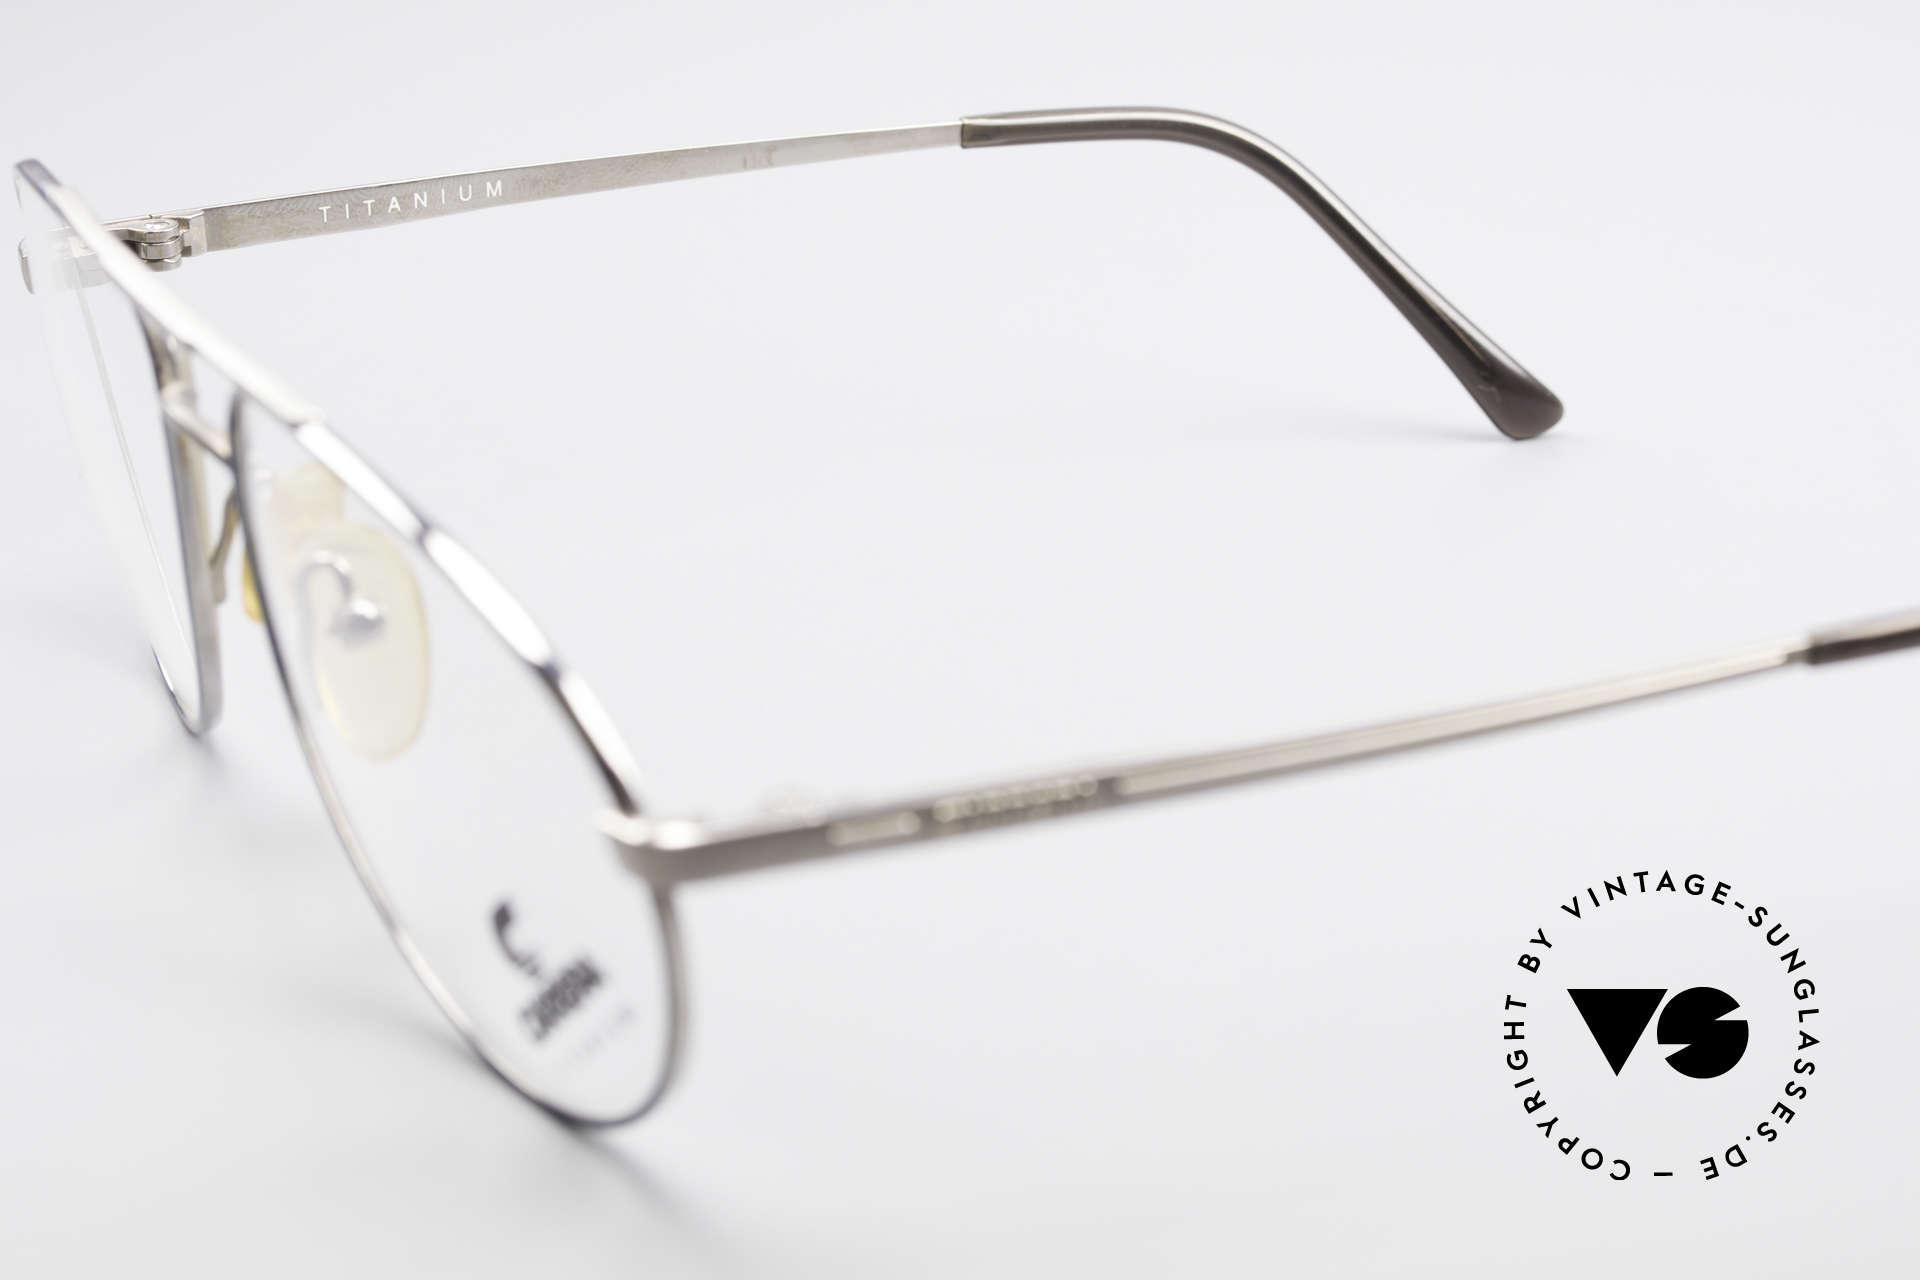 Carrera 5798 Titanium Vintage Eyeglasses, NO RETRO EYEWEAR, but a 25 years old ORIGINAL!, Made for Men